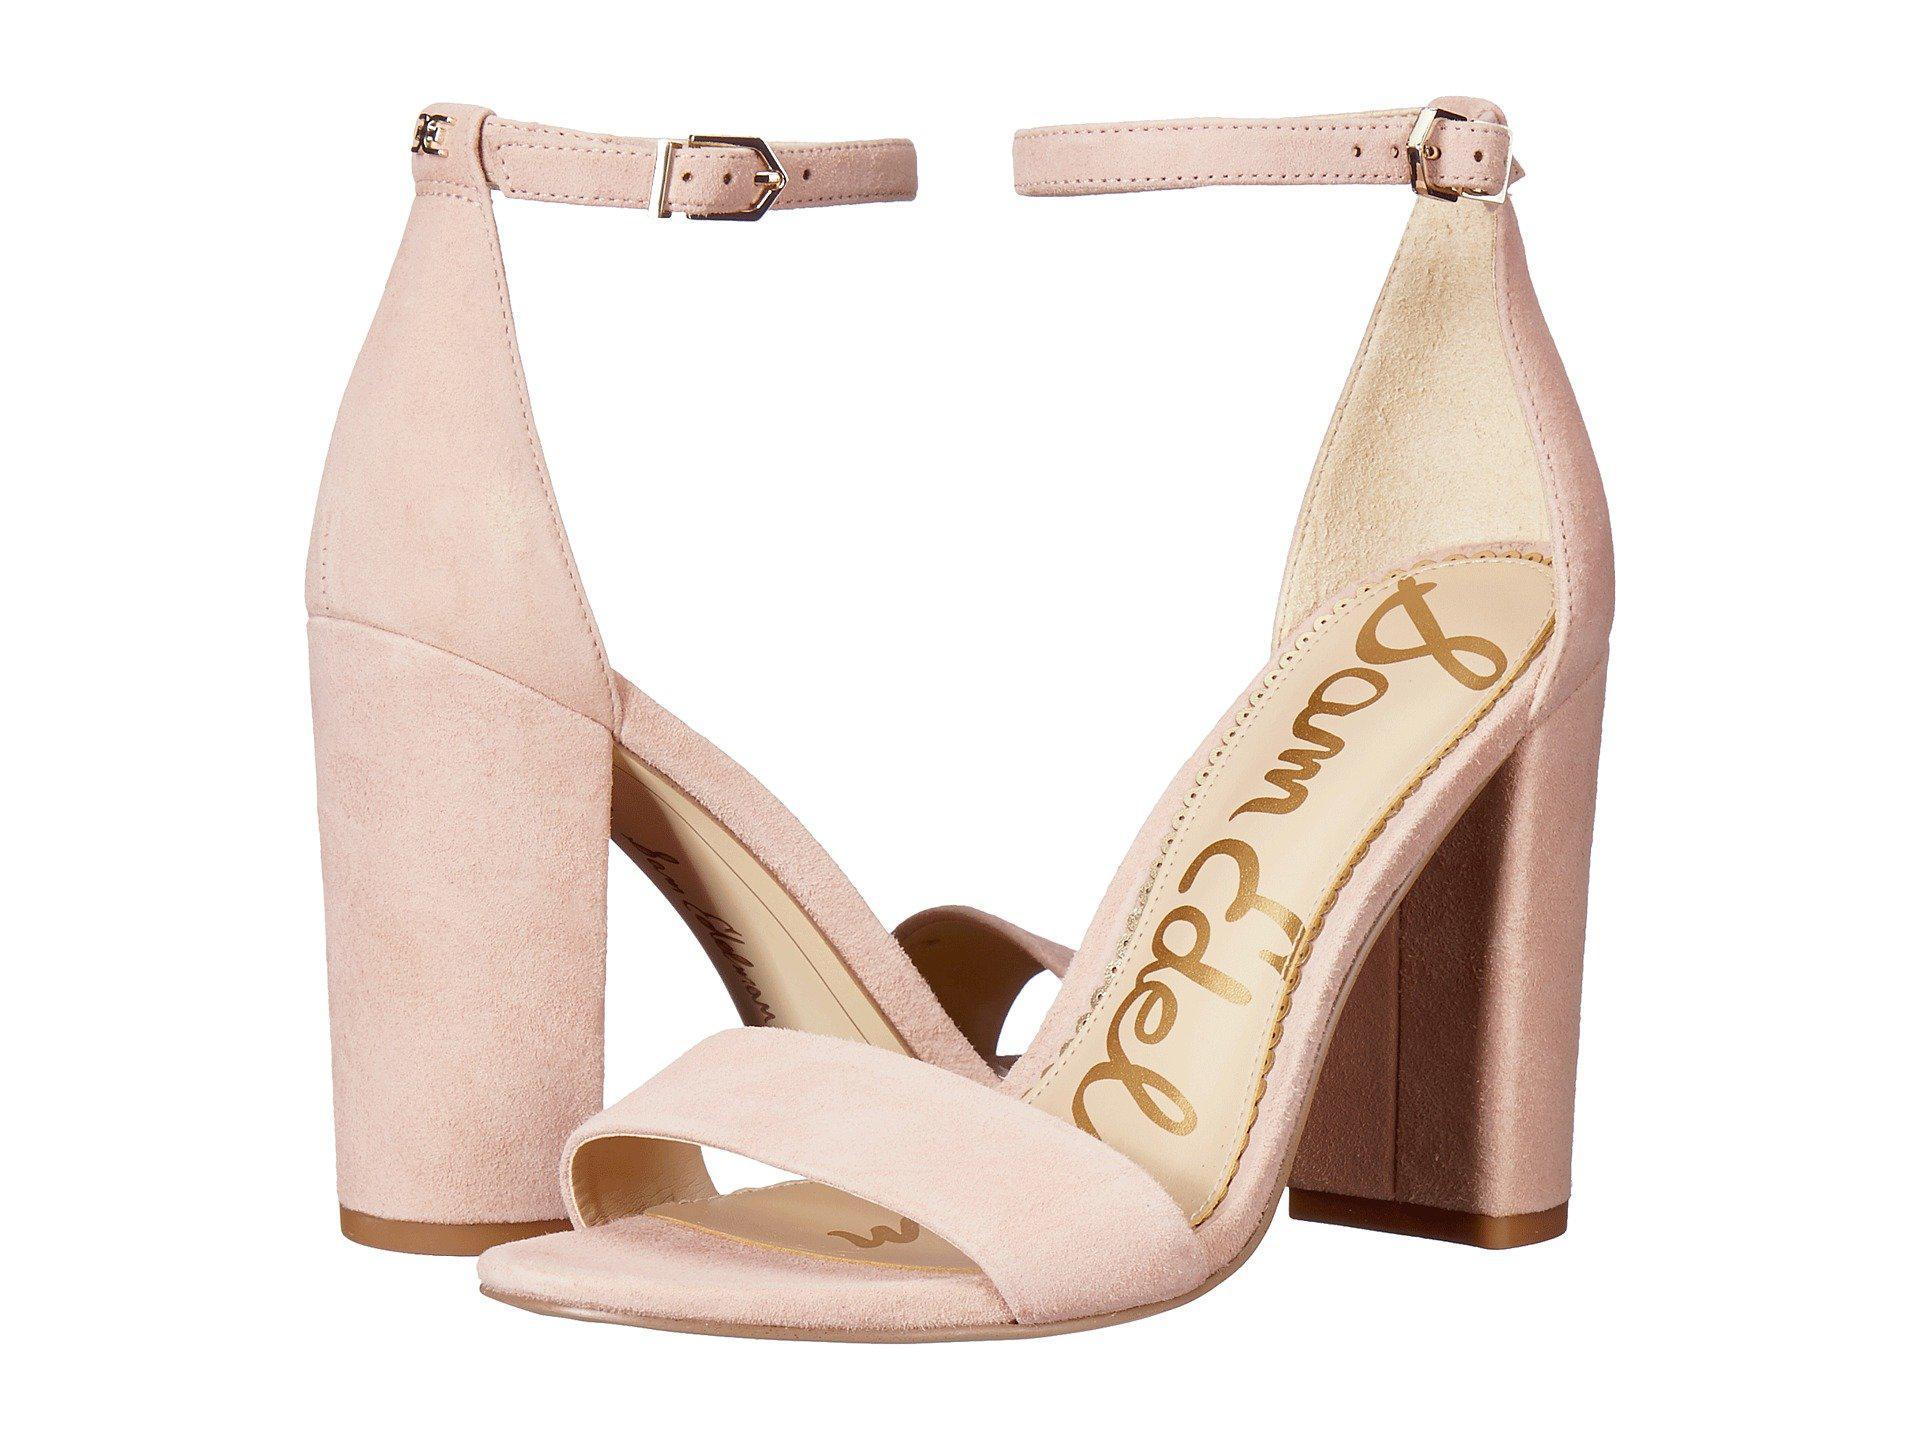 1e11eaf51de Lyst - Sam Edelman Yaro Ankle Strap Sandal Heel in Pink - Save 43%